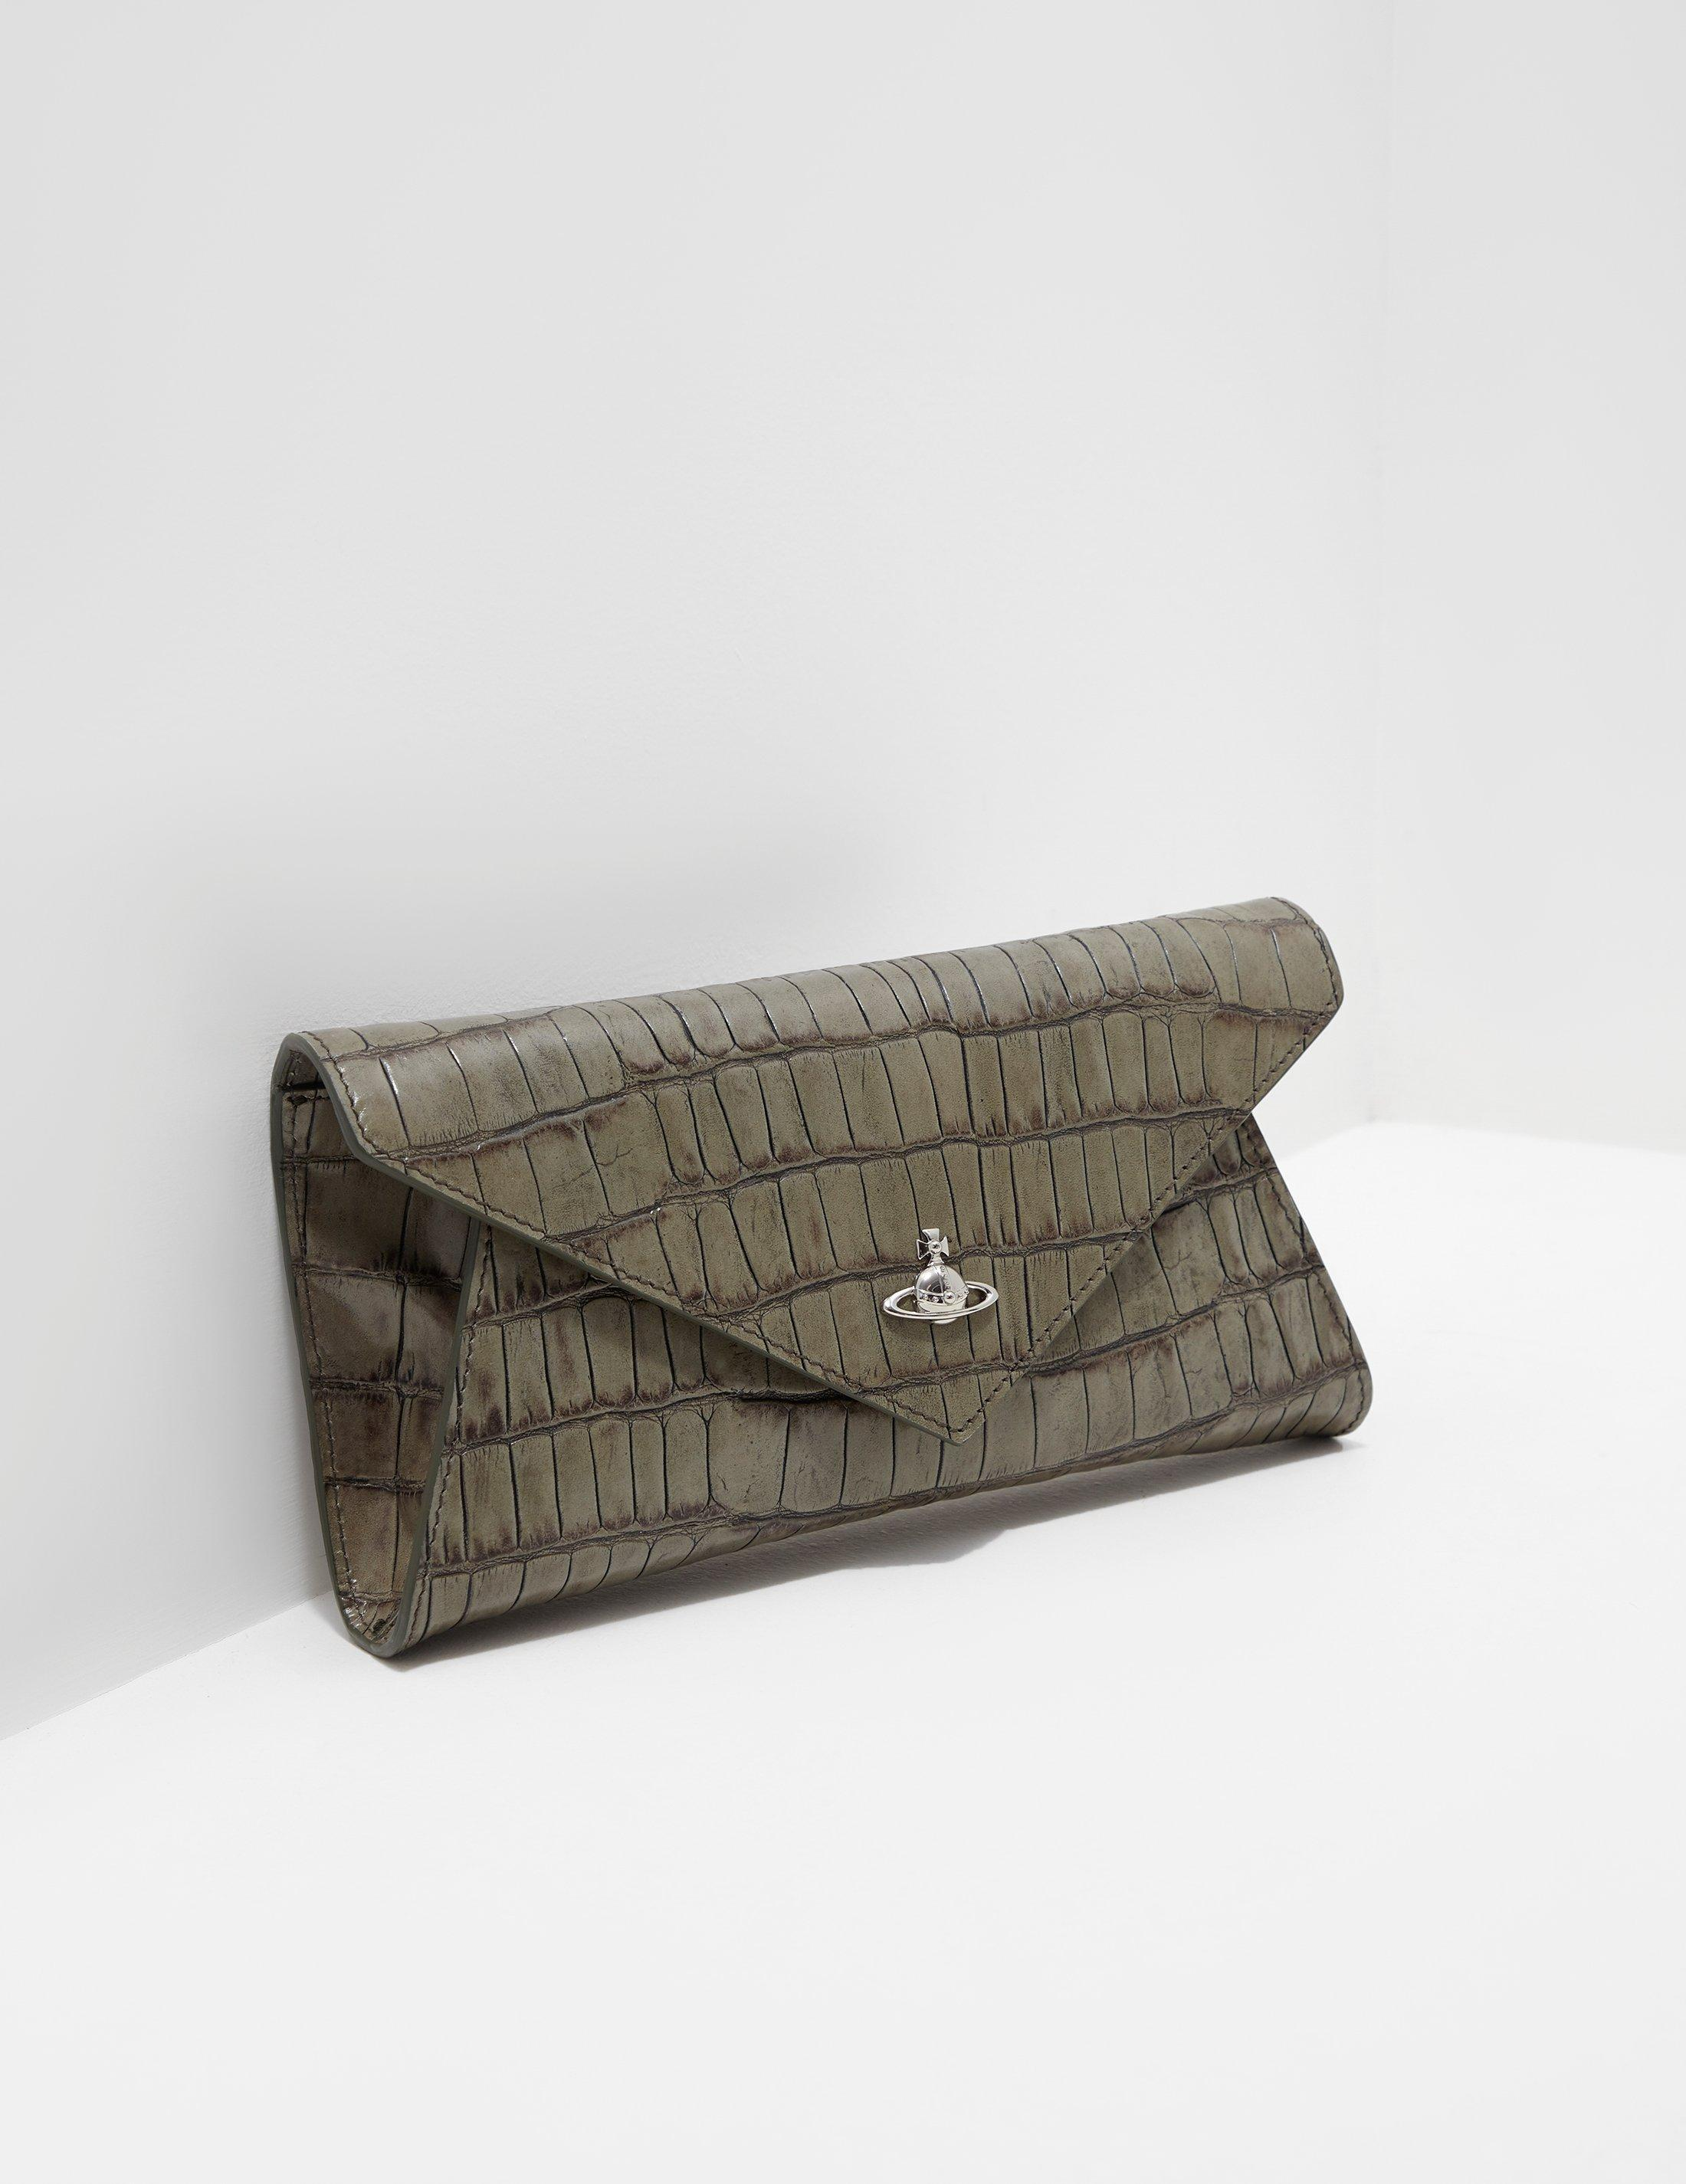 4b1fec60c79 Vivienne Westwood Womens Lisa Croc Envelope Clutch Bag - Online ...